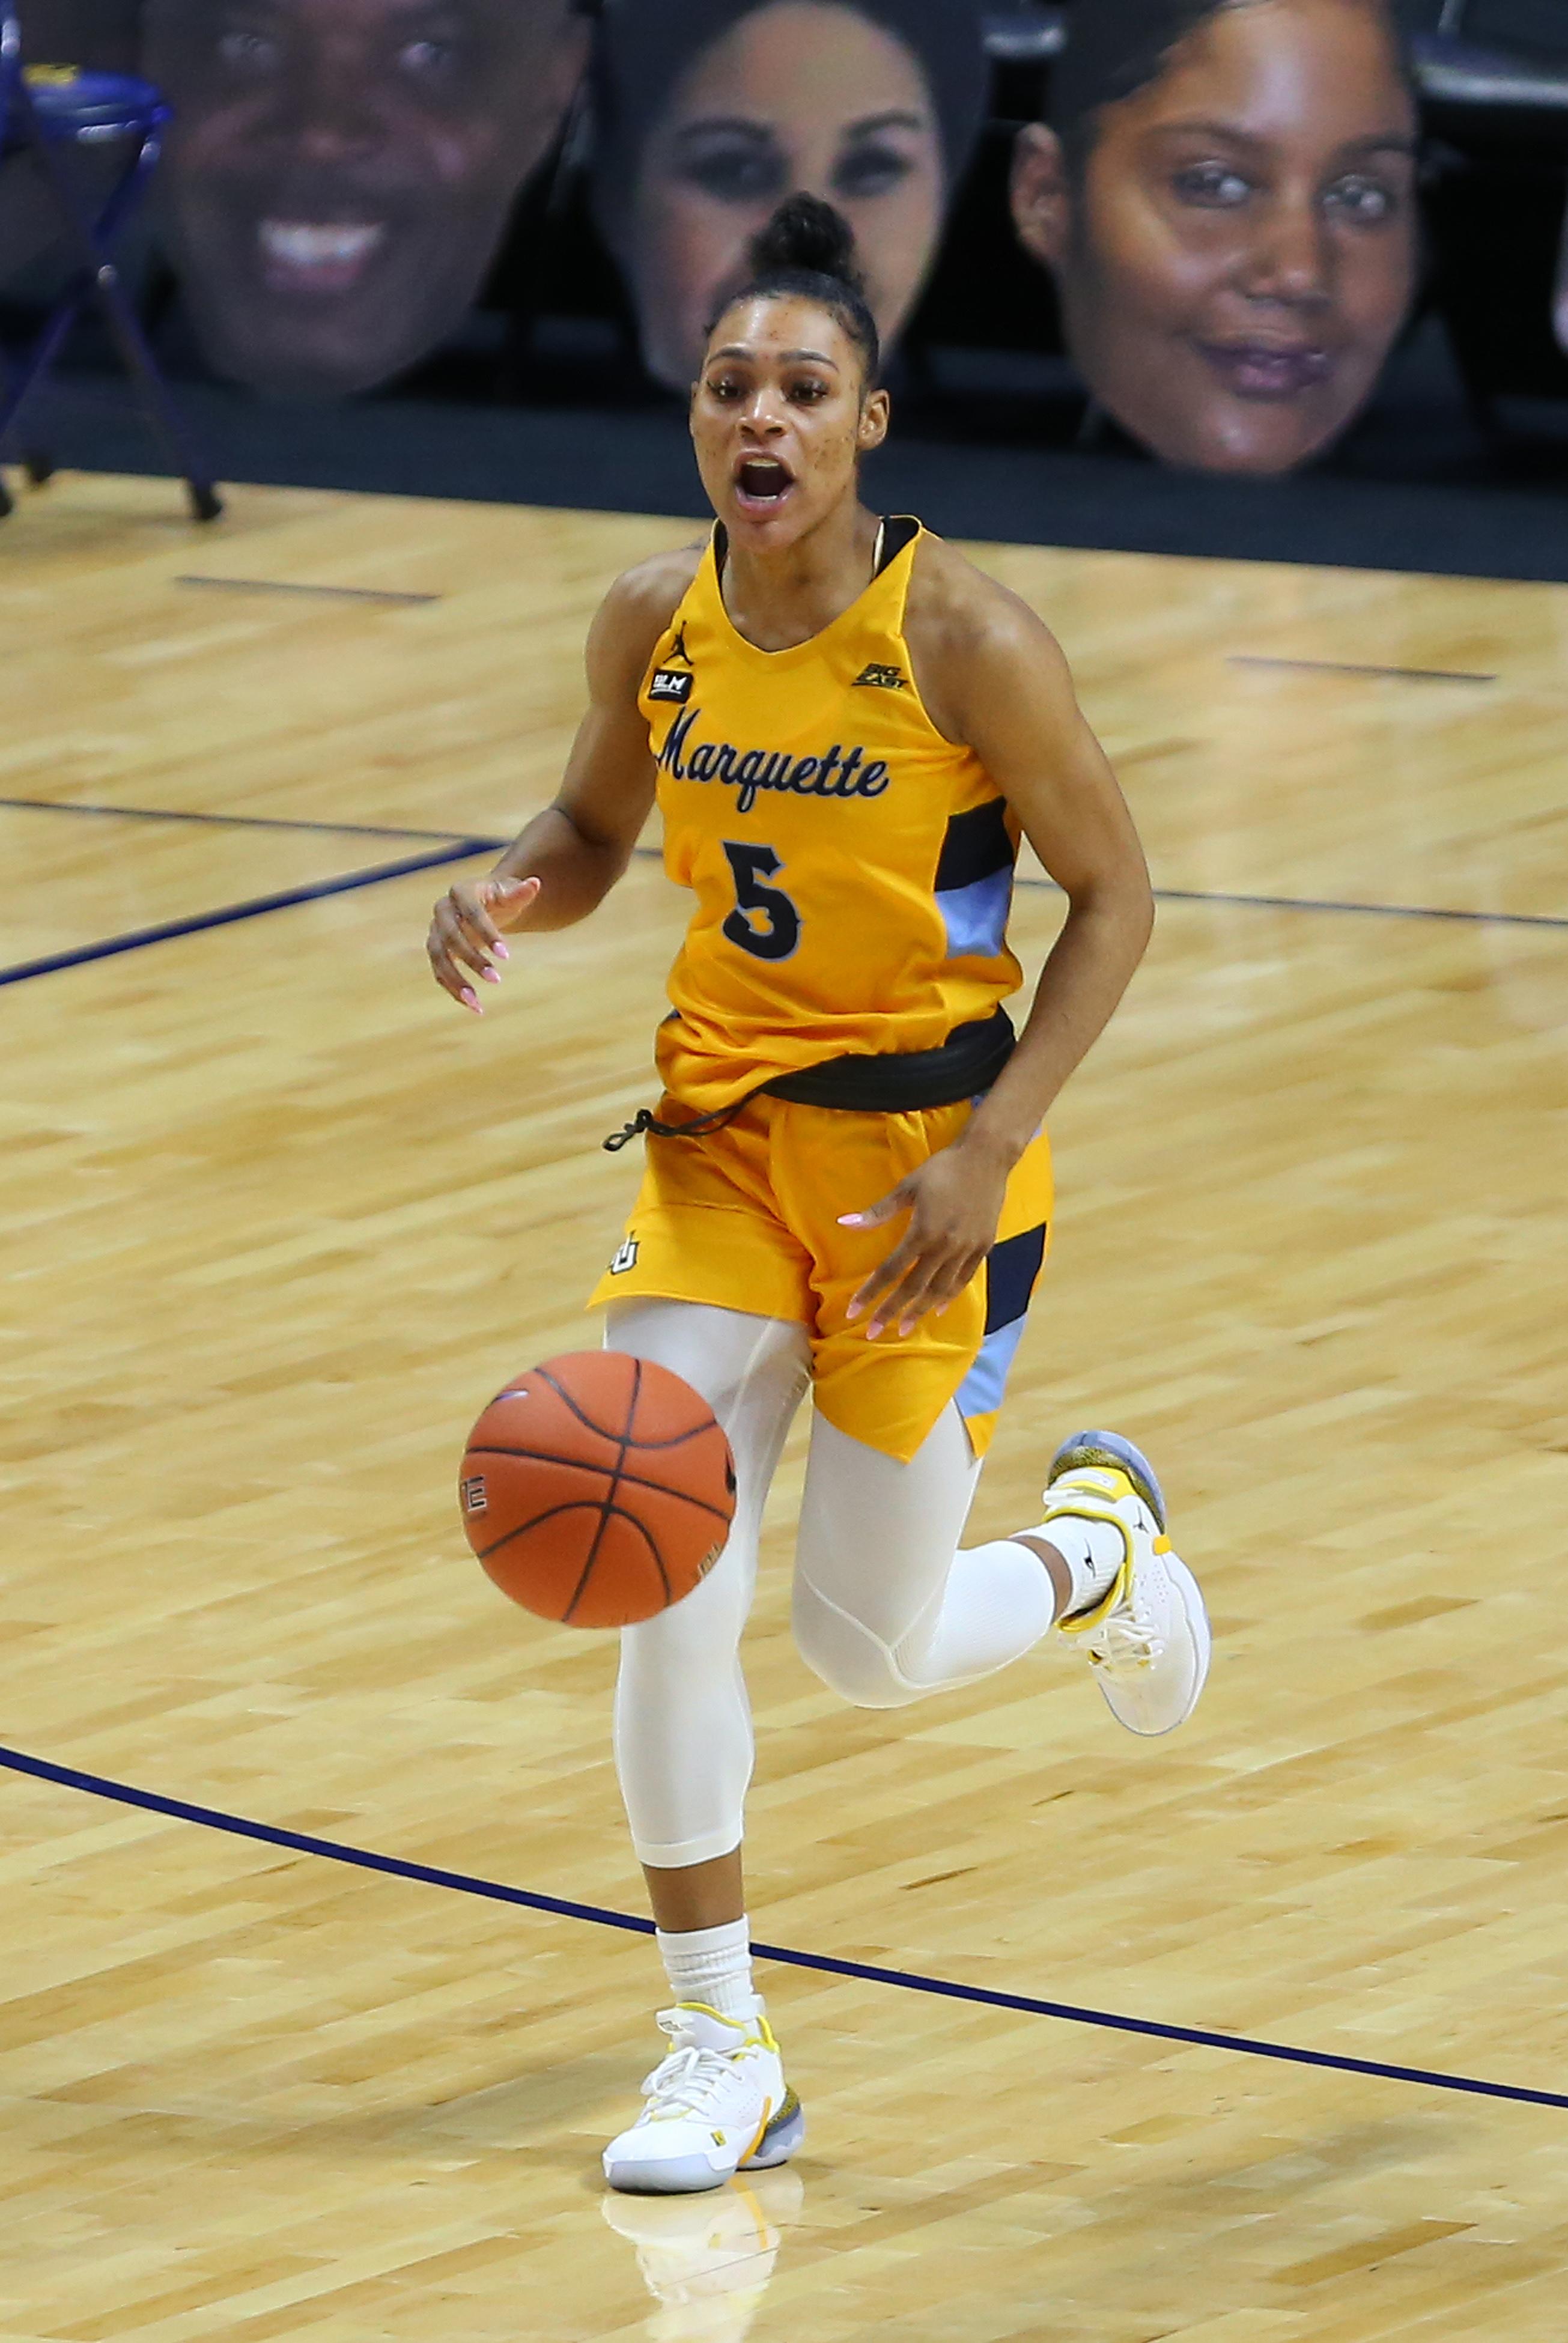 COLLEGE BASKETBALL: MAR 07 Big East Women's Basketball Tournament - Creighton v Marquette